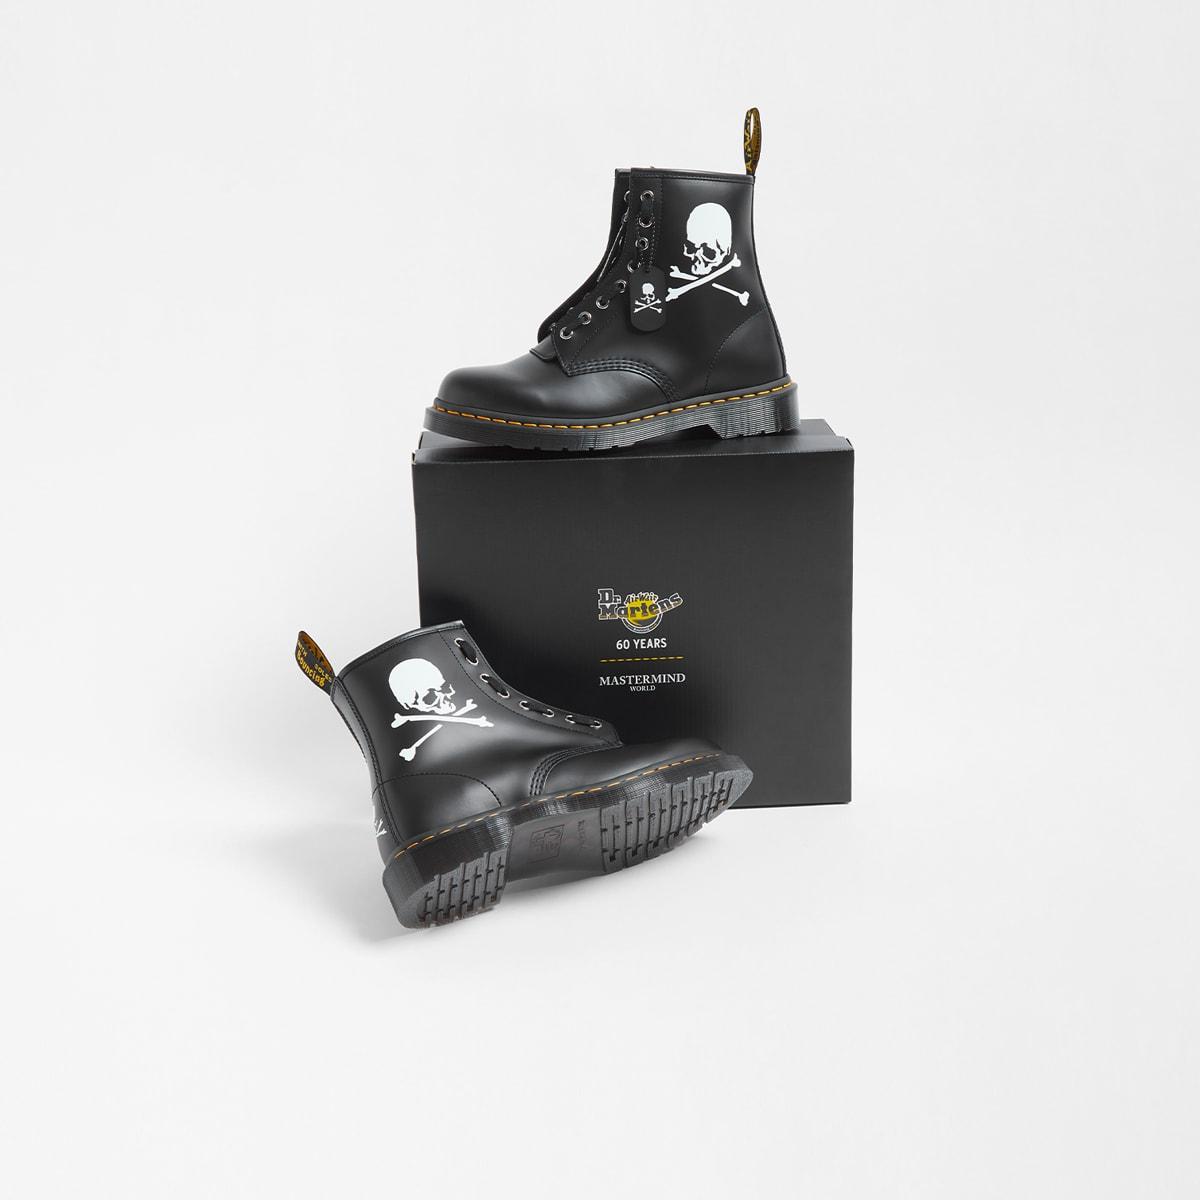 Dr. Martens x MASTERMIND WORLD 1460 Remastered Boot - 26516009